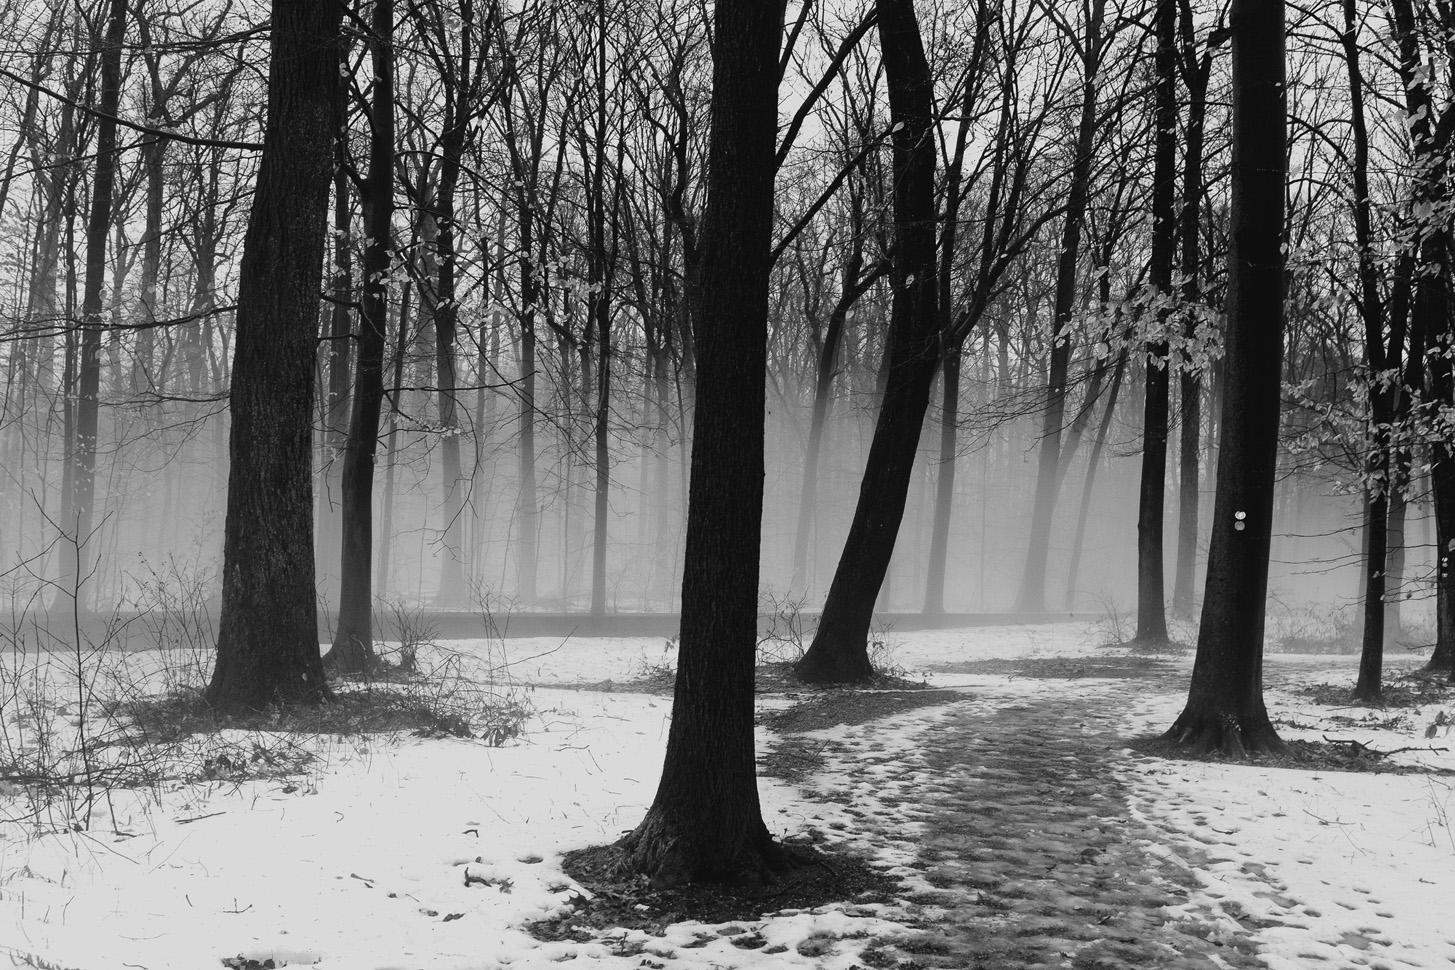 011218-photo-walk-snow-fog-rain-19.jpg